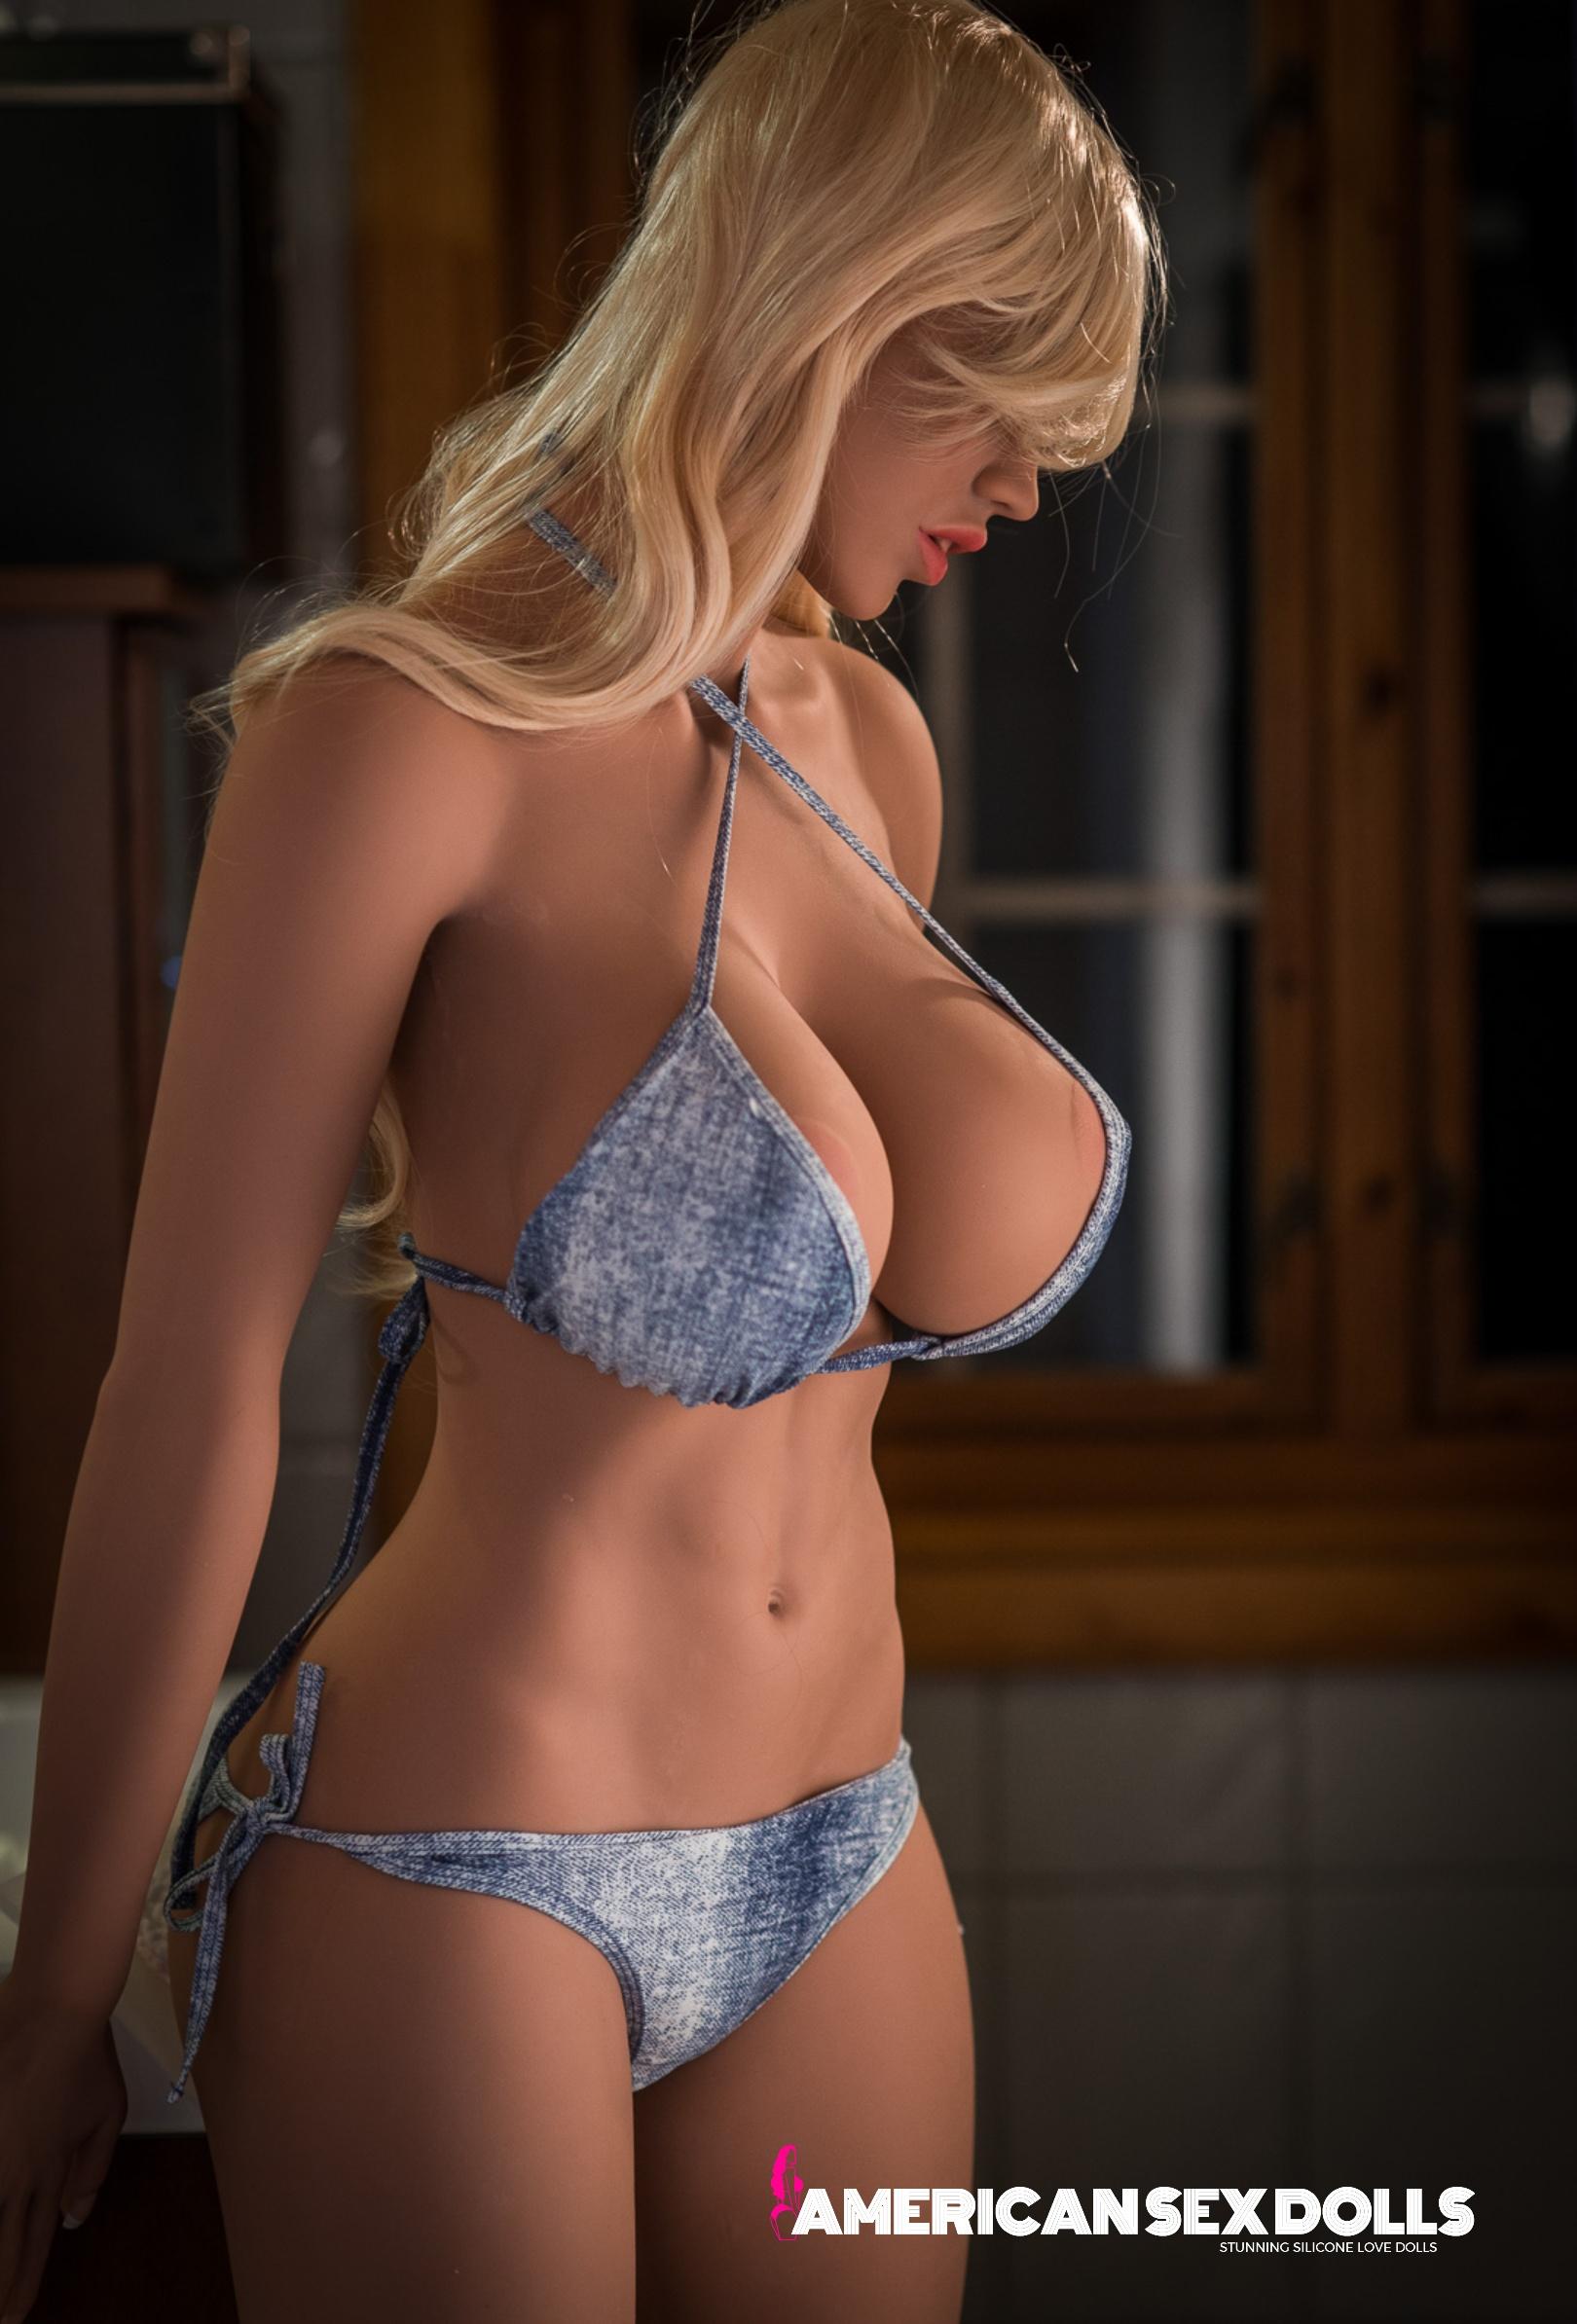 American Sex Doll 170cm blonde (6).jpg